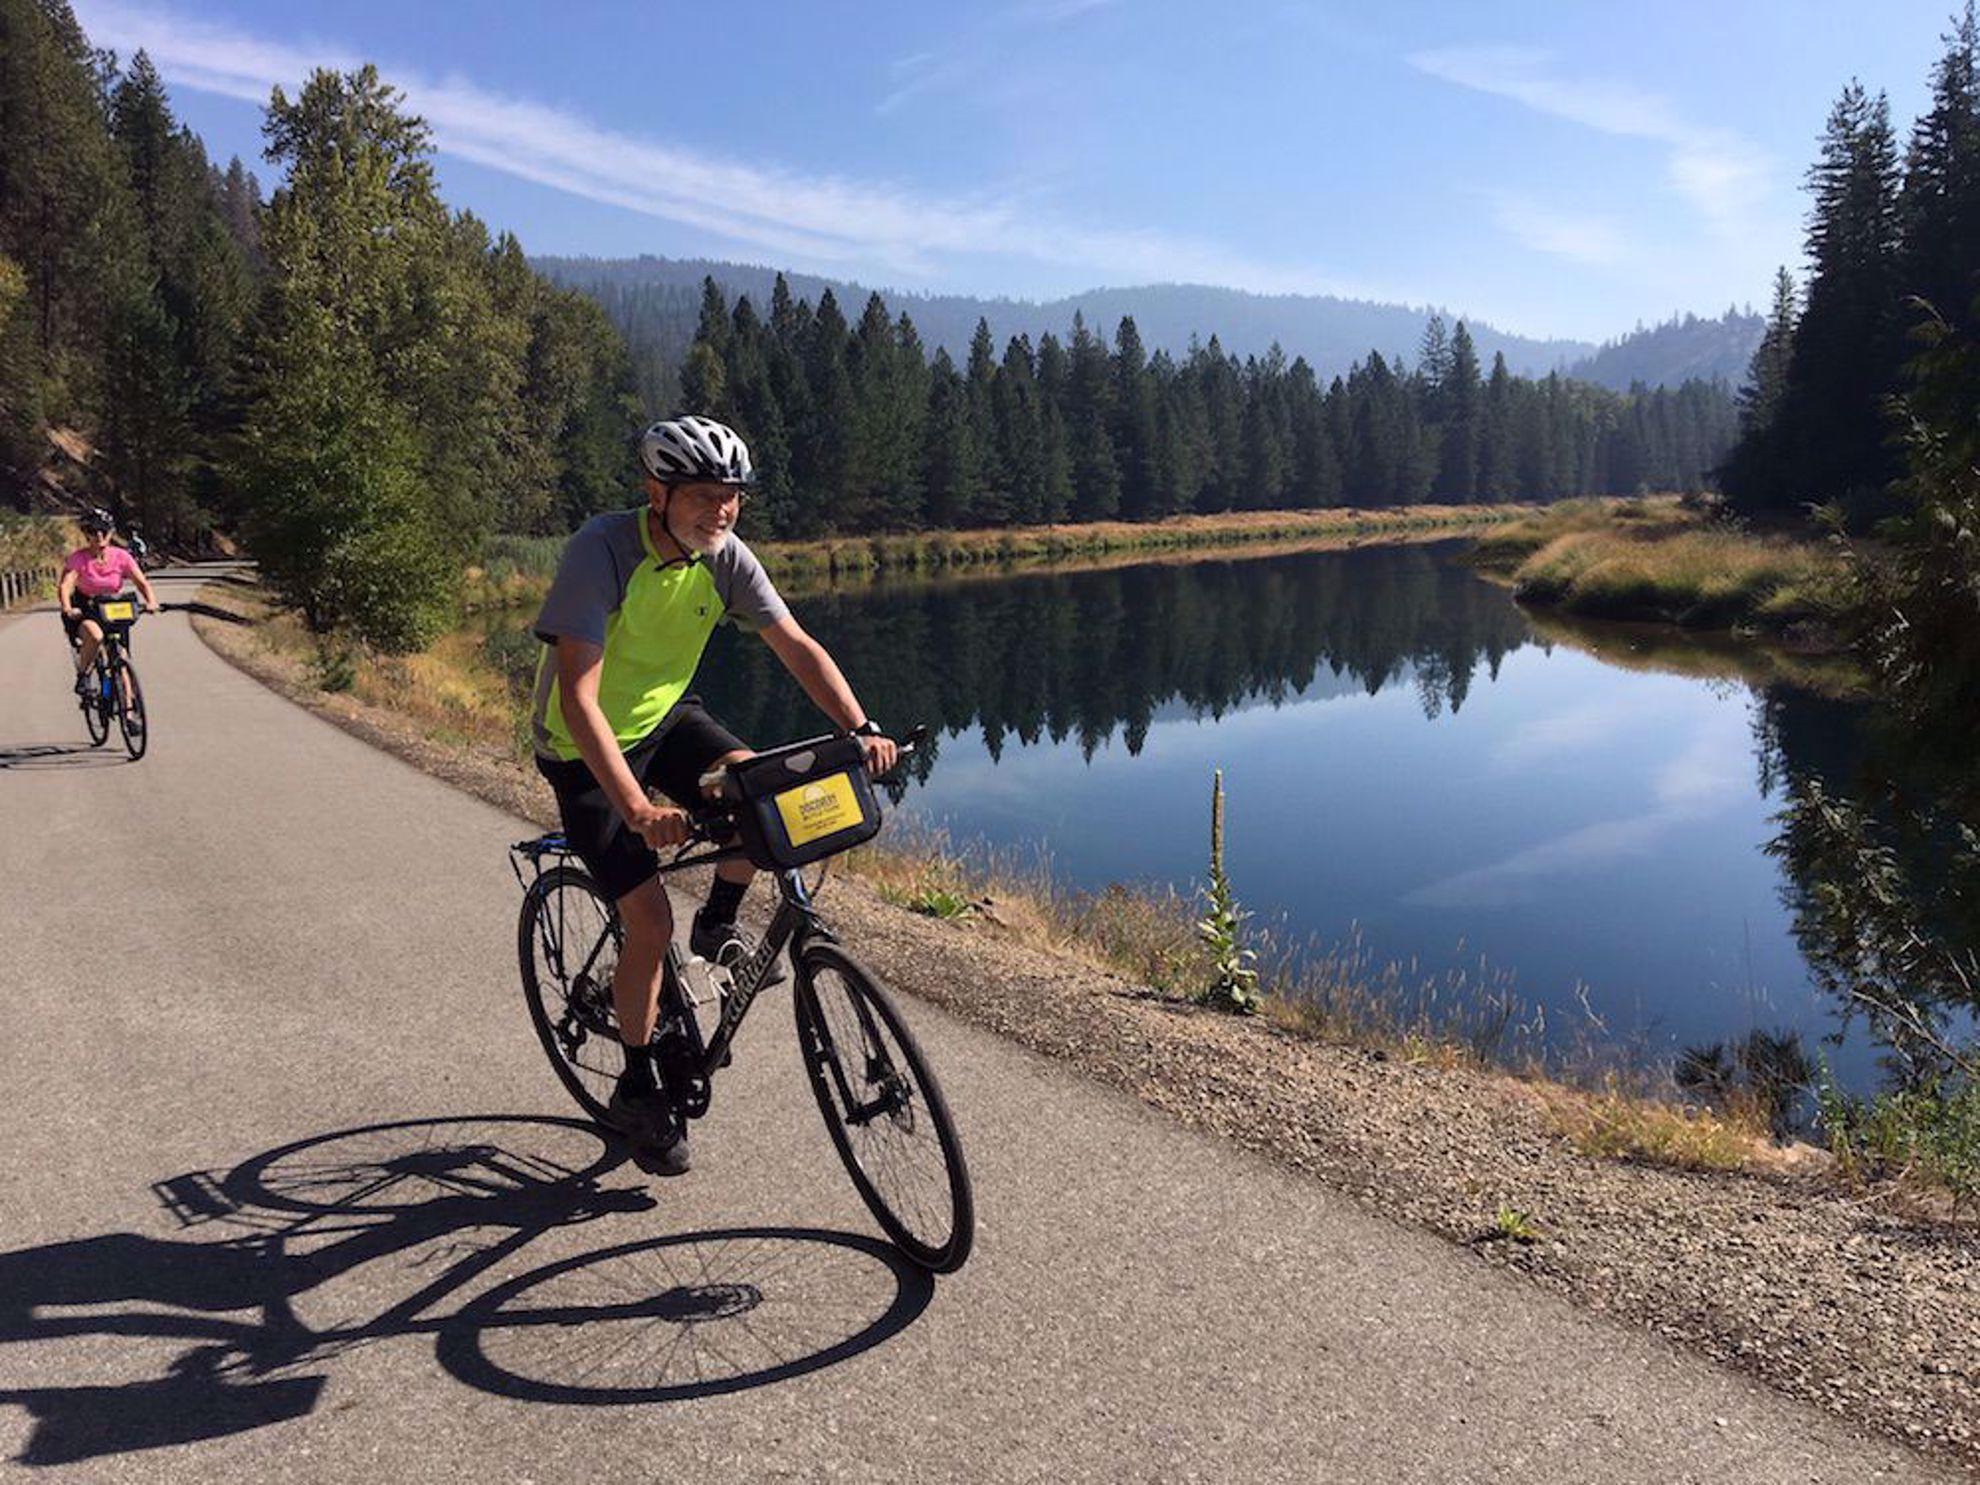 Rider by water Idaho